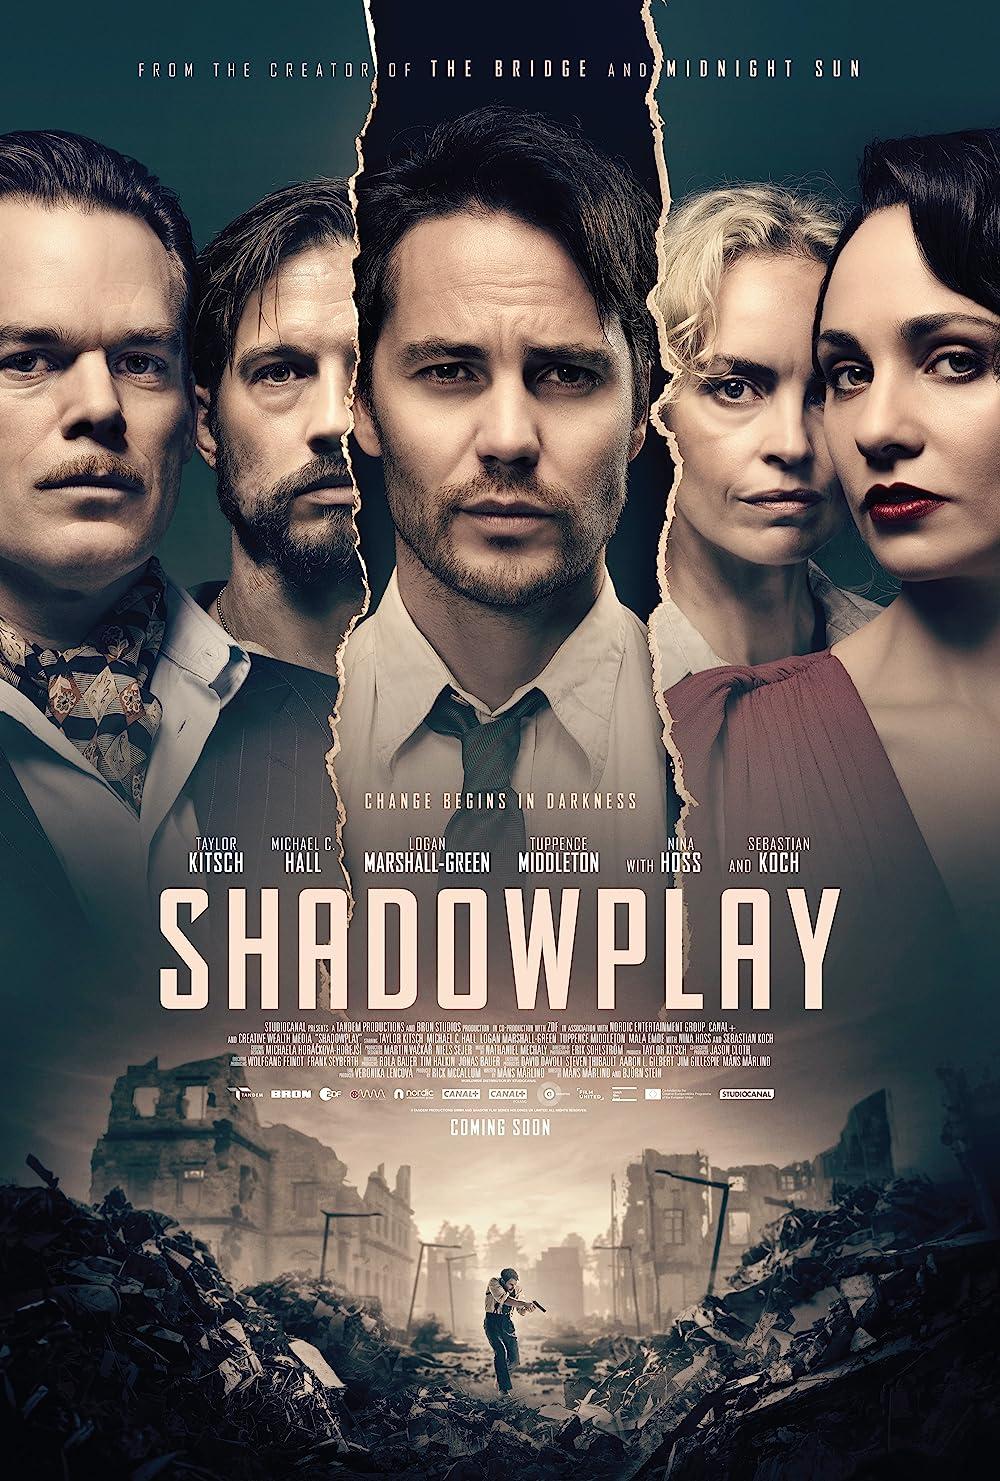 The Defeated (Shadowplay) 2021 S01 Hindi Dubbed Netflix Original Series 480p HDRip 1.1GB Download